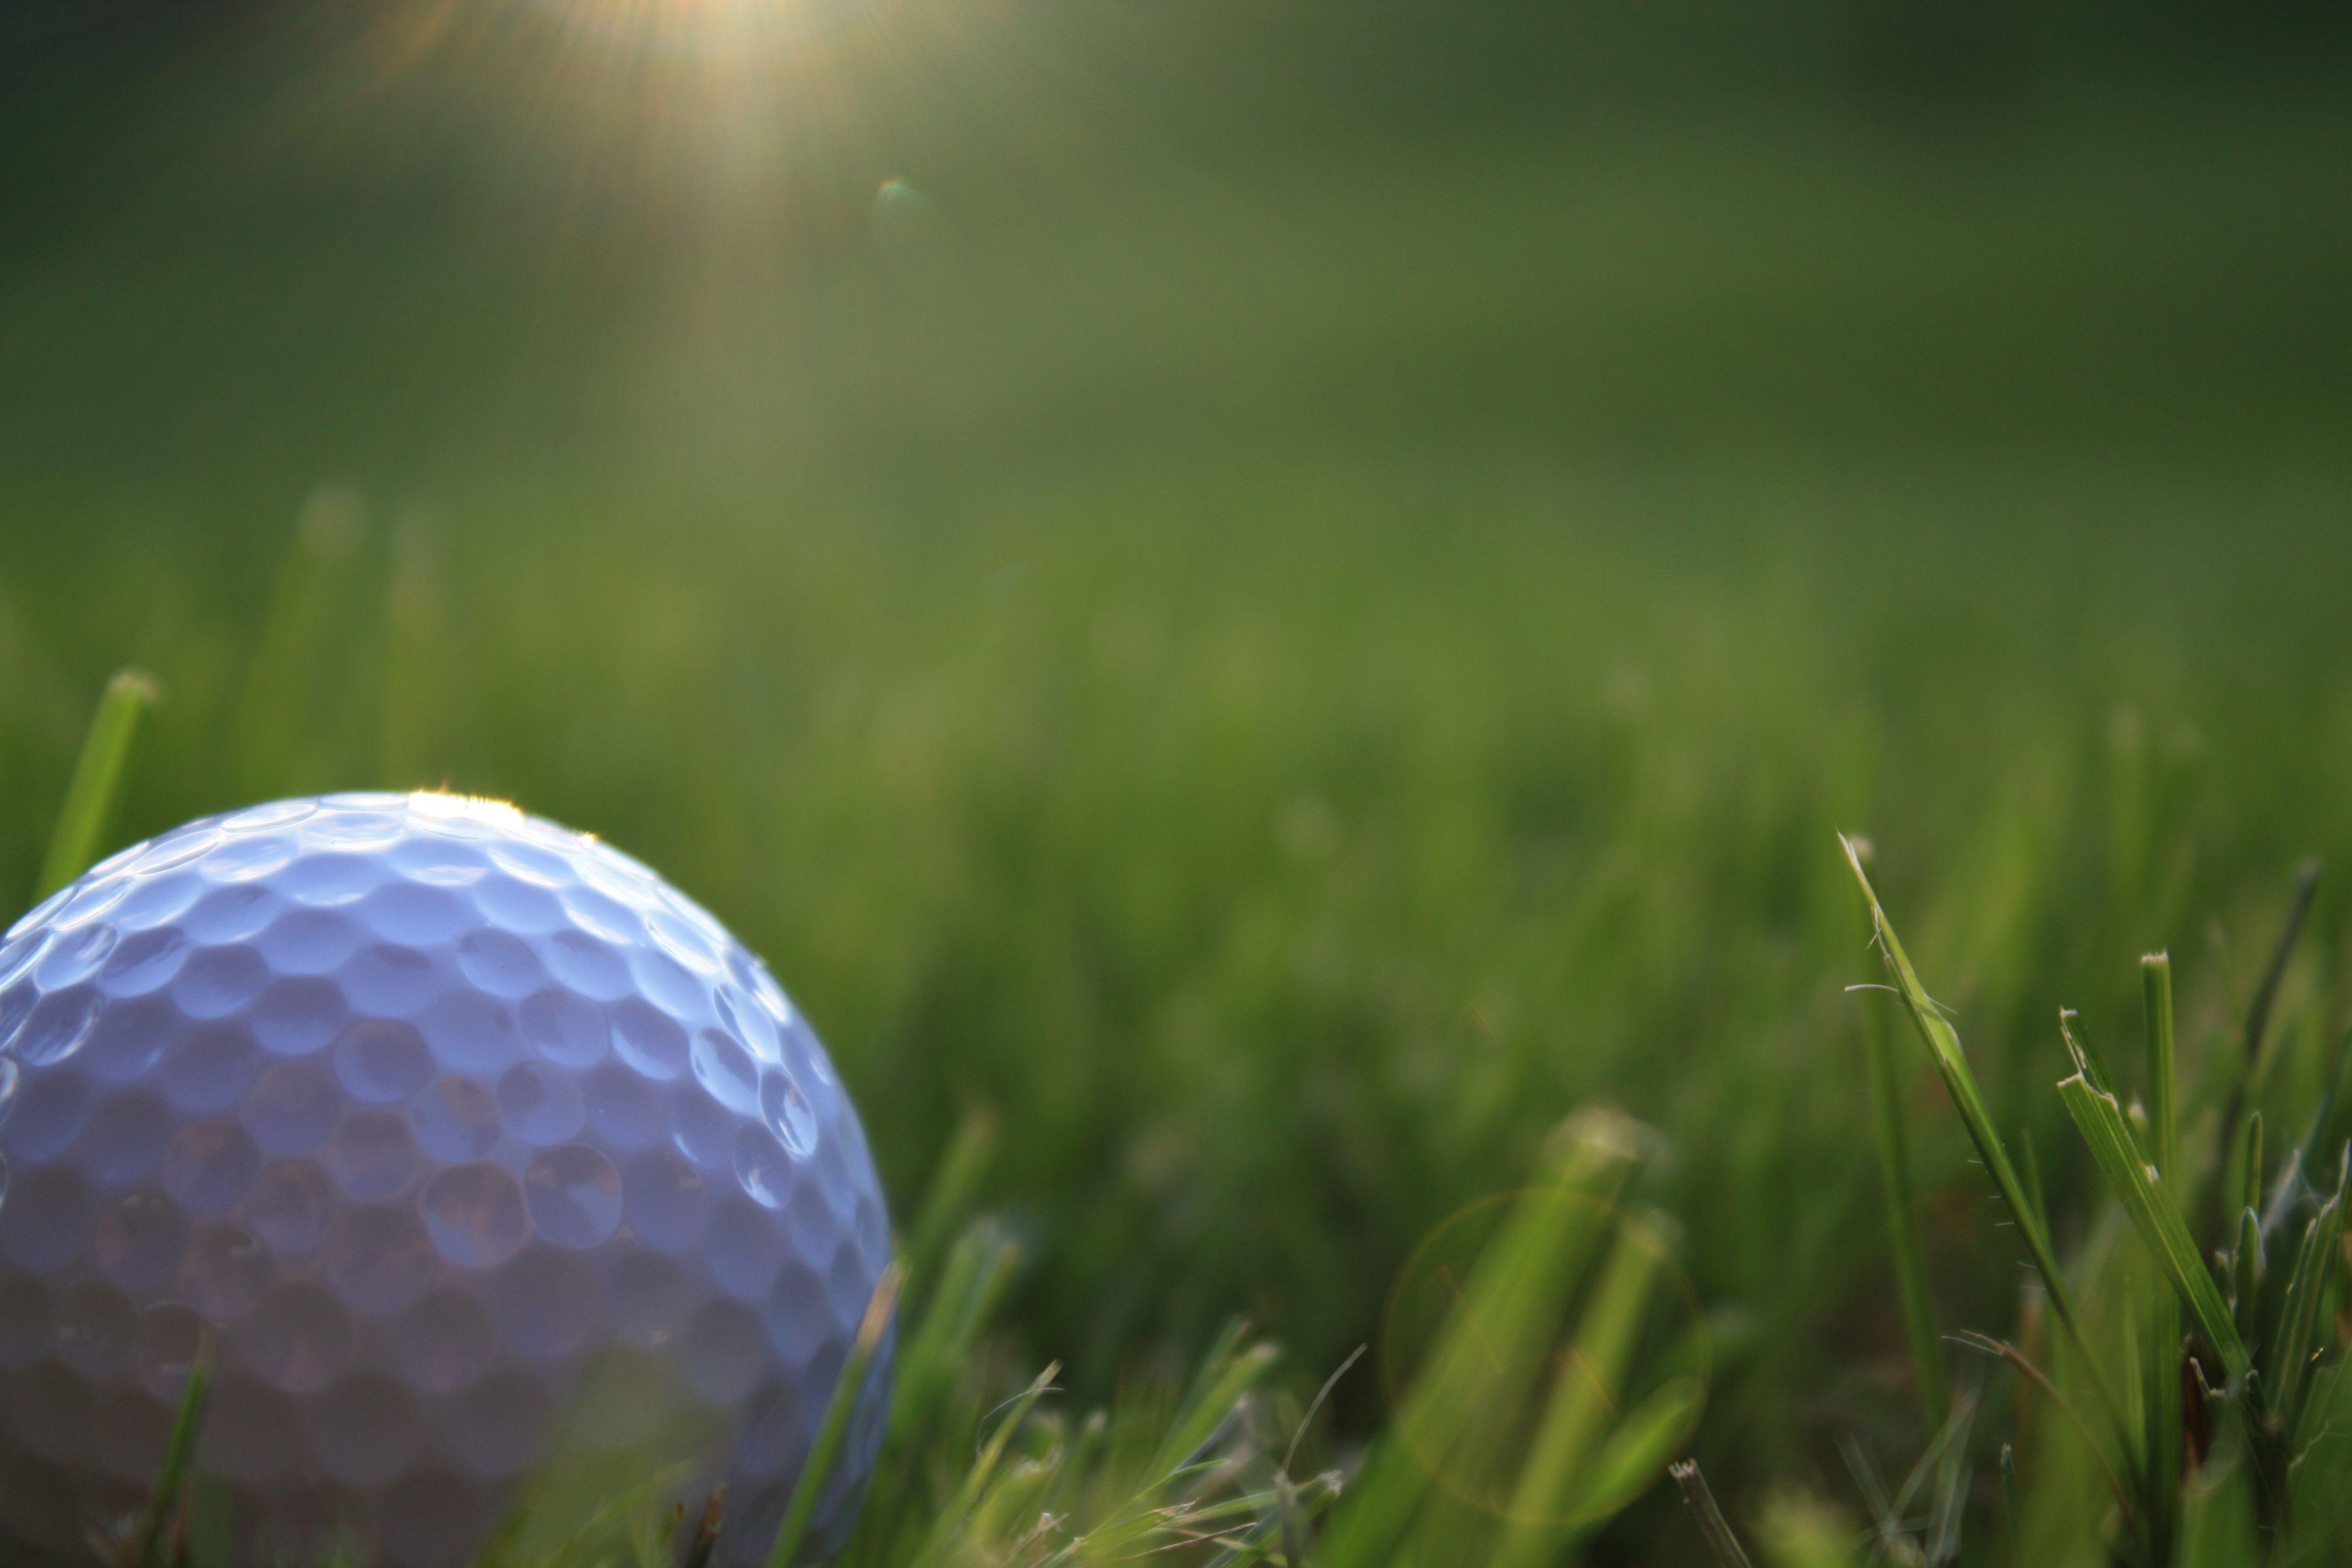 Golf Scene Wallpapers - Wallpaper Cave